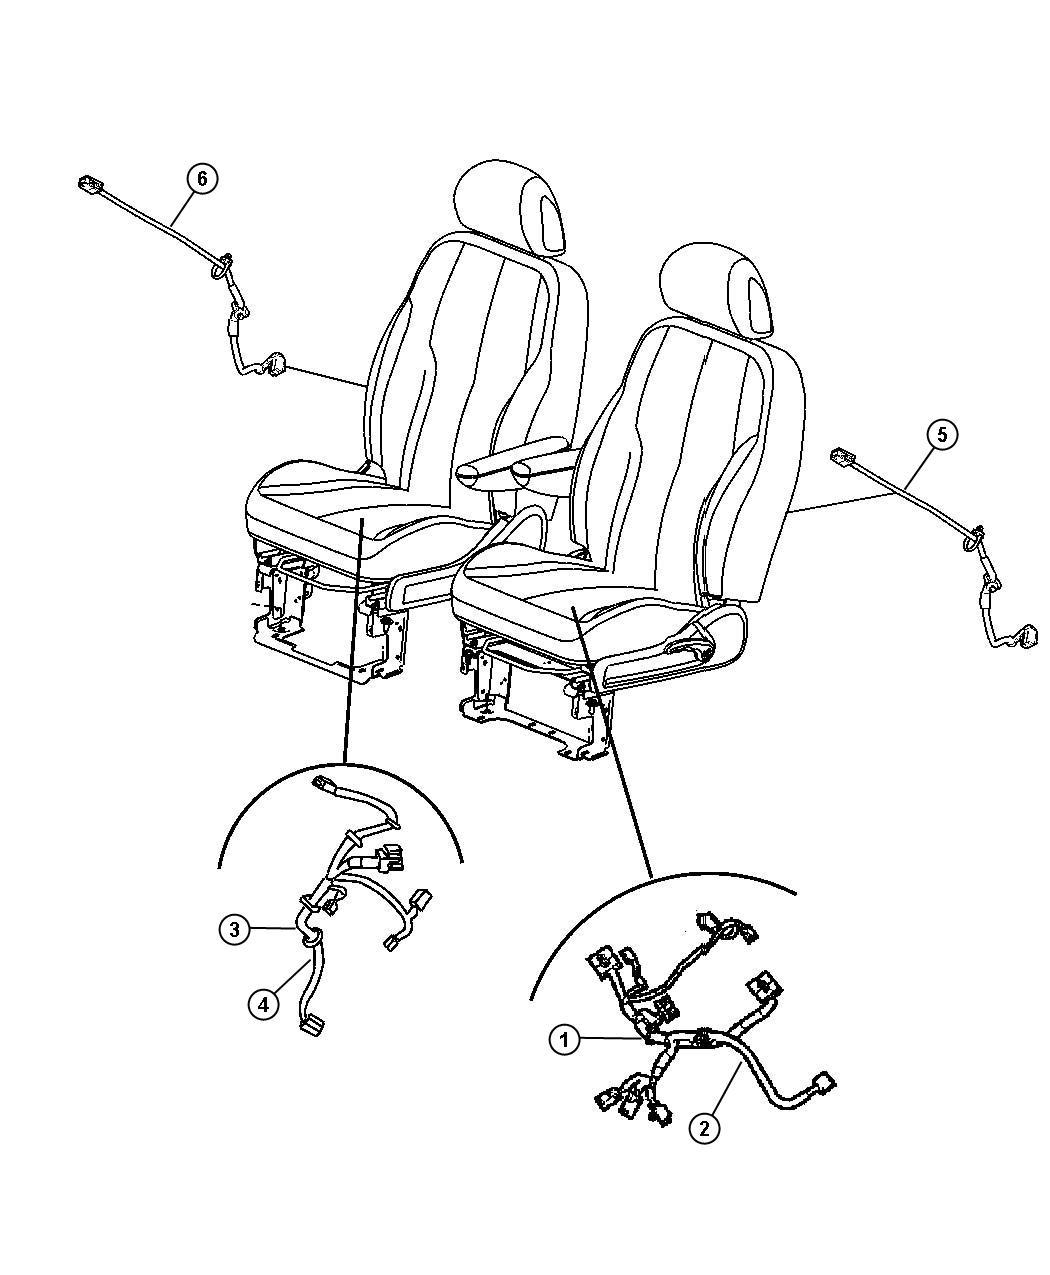 Chrysler Pt Cruiser Wiring  Power Seat  Power  Side Air